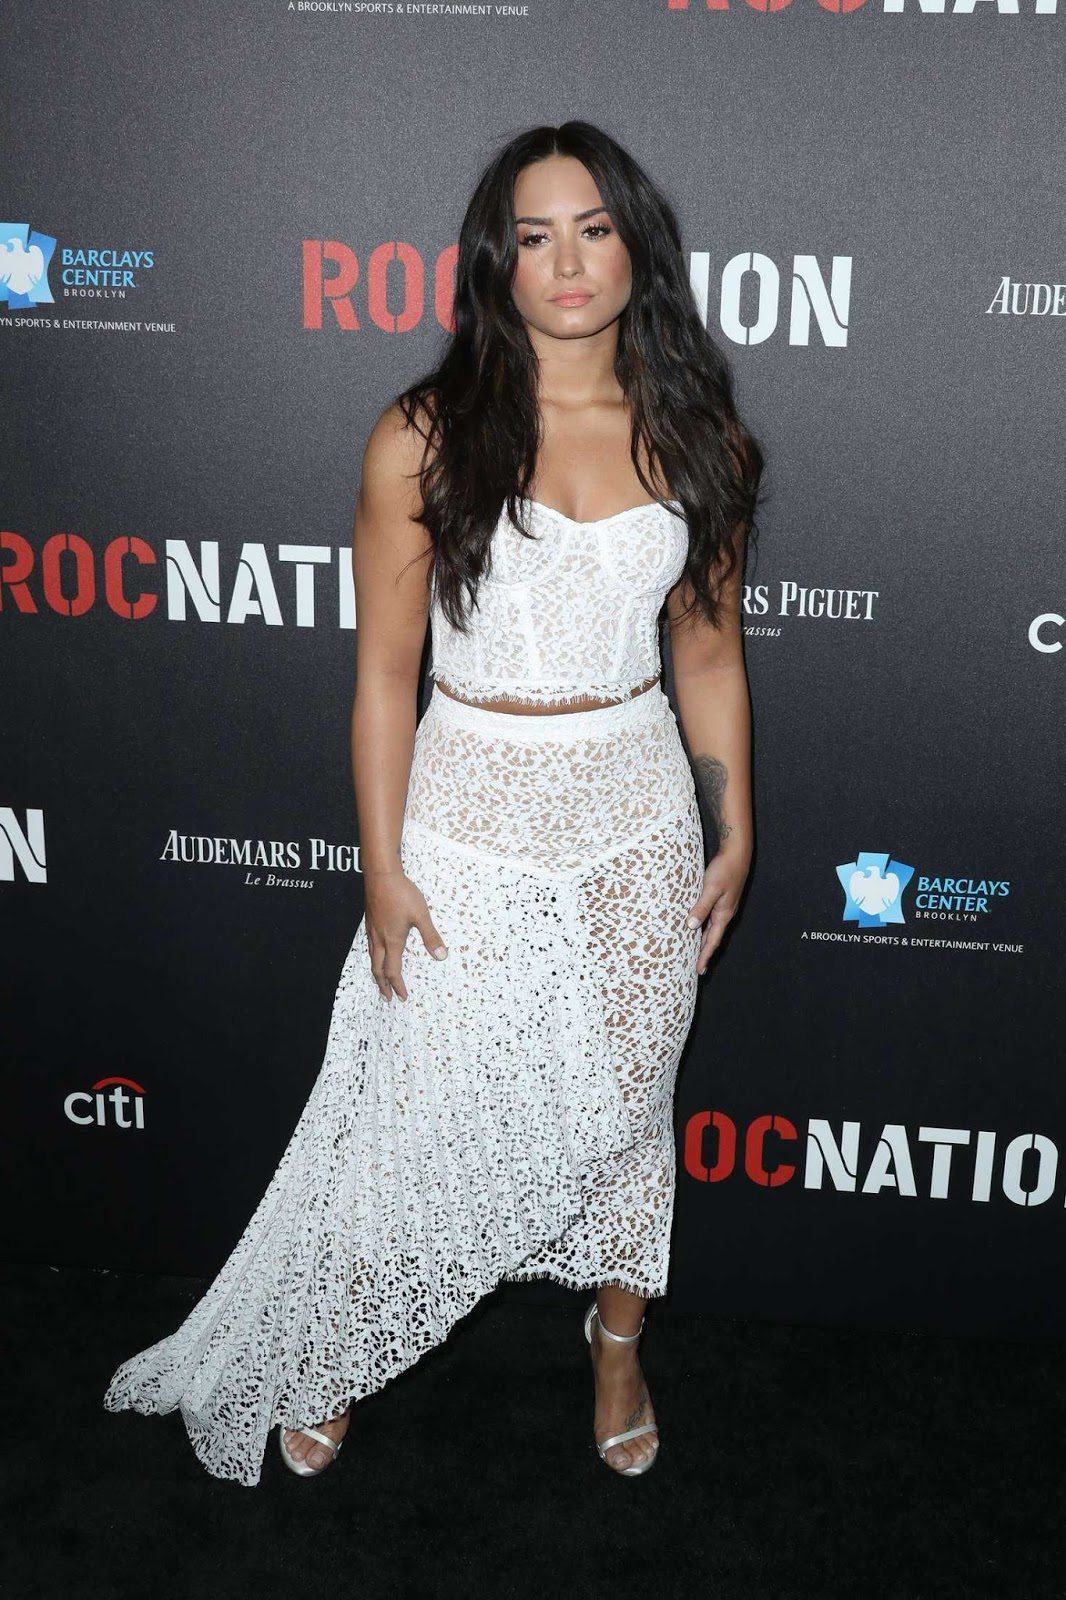 Demi Lovato wears lace corset and skirt to a Pre-Grammy brunch in LA